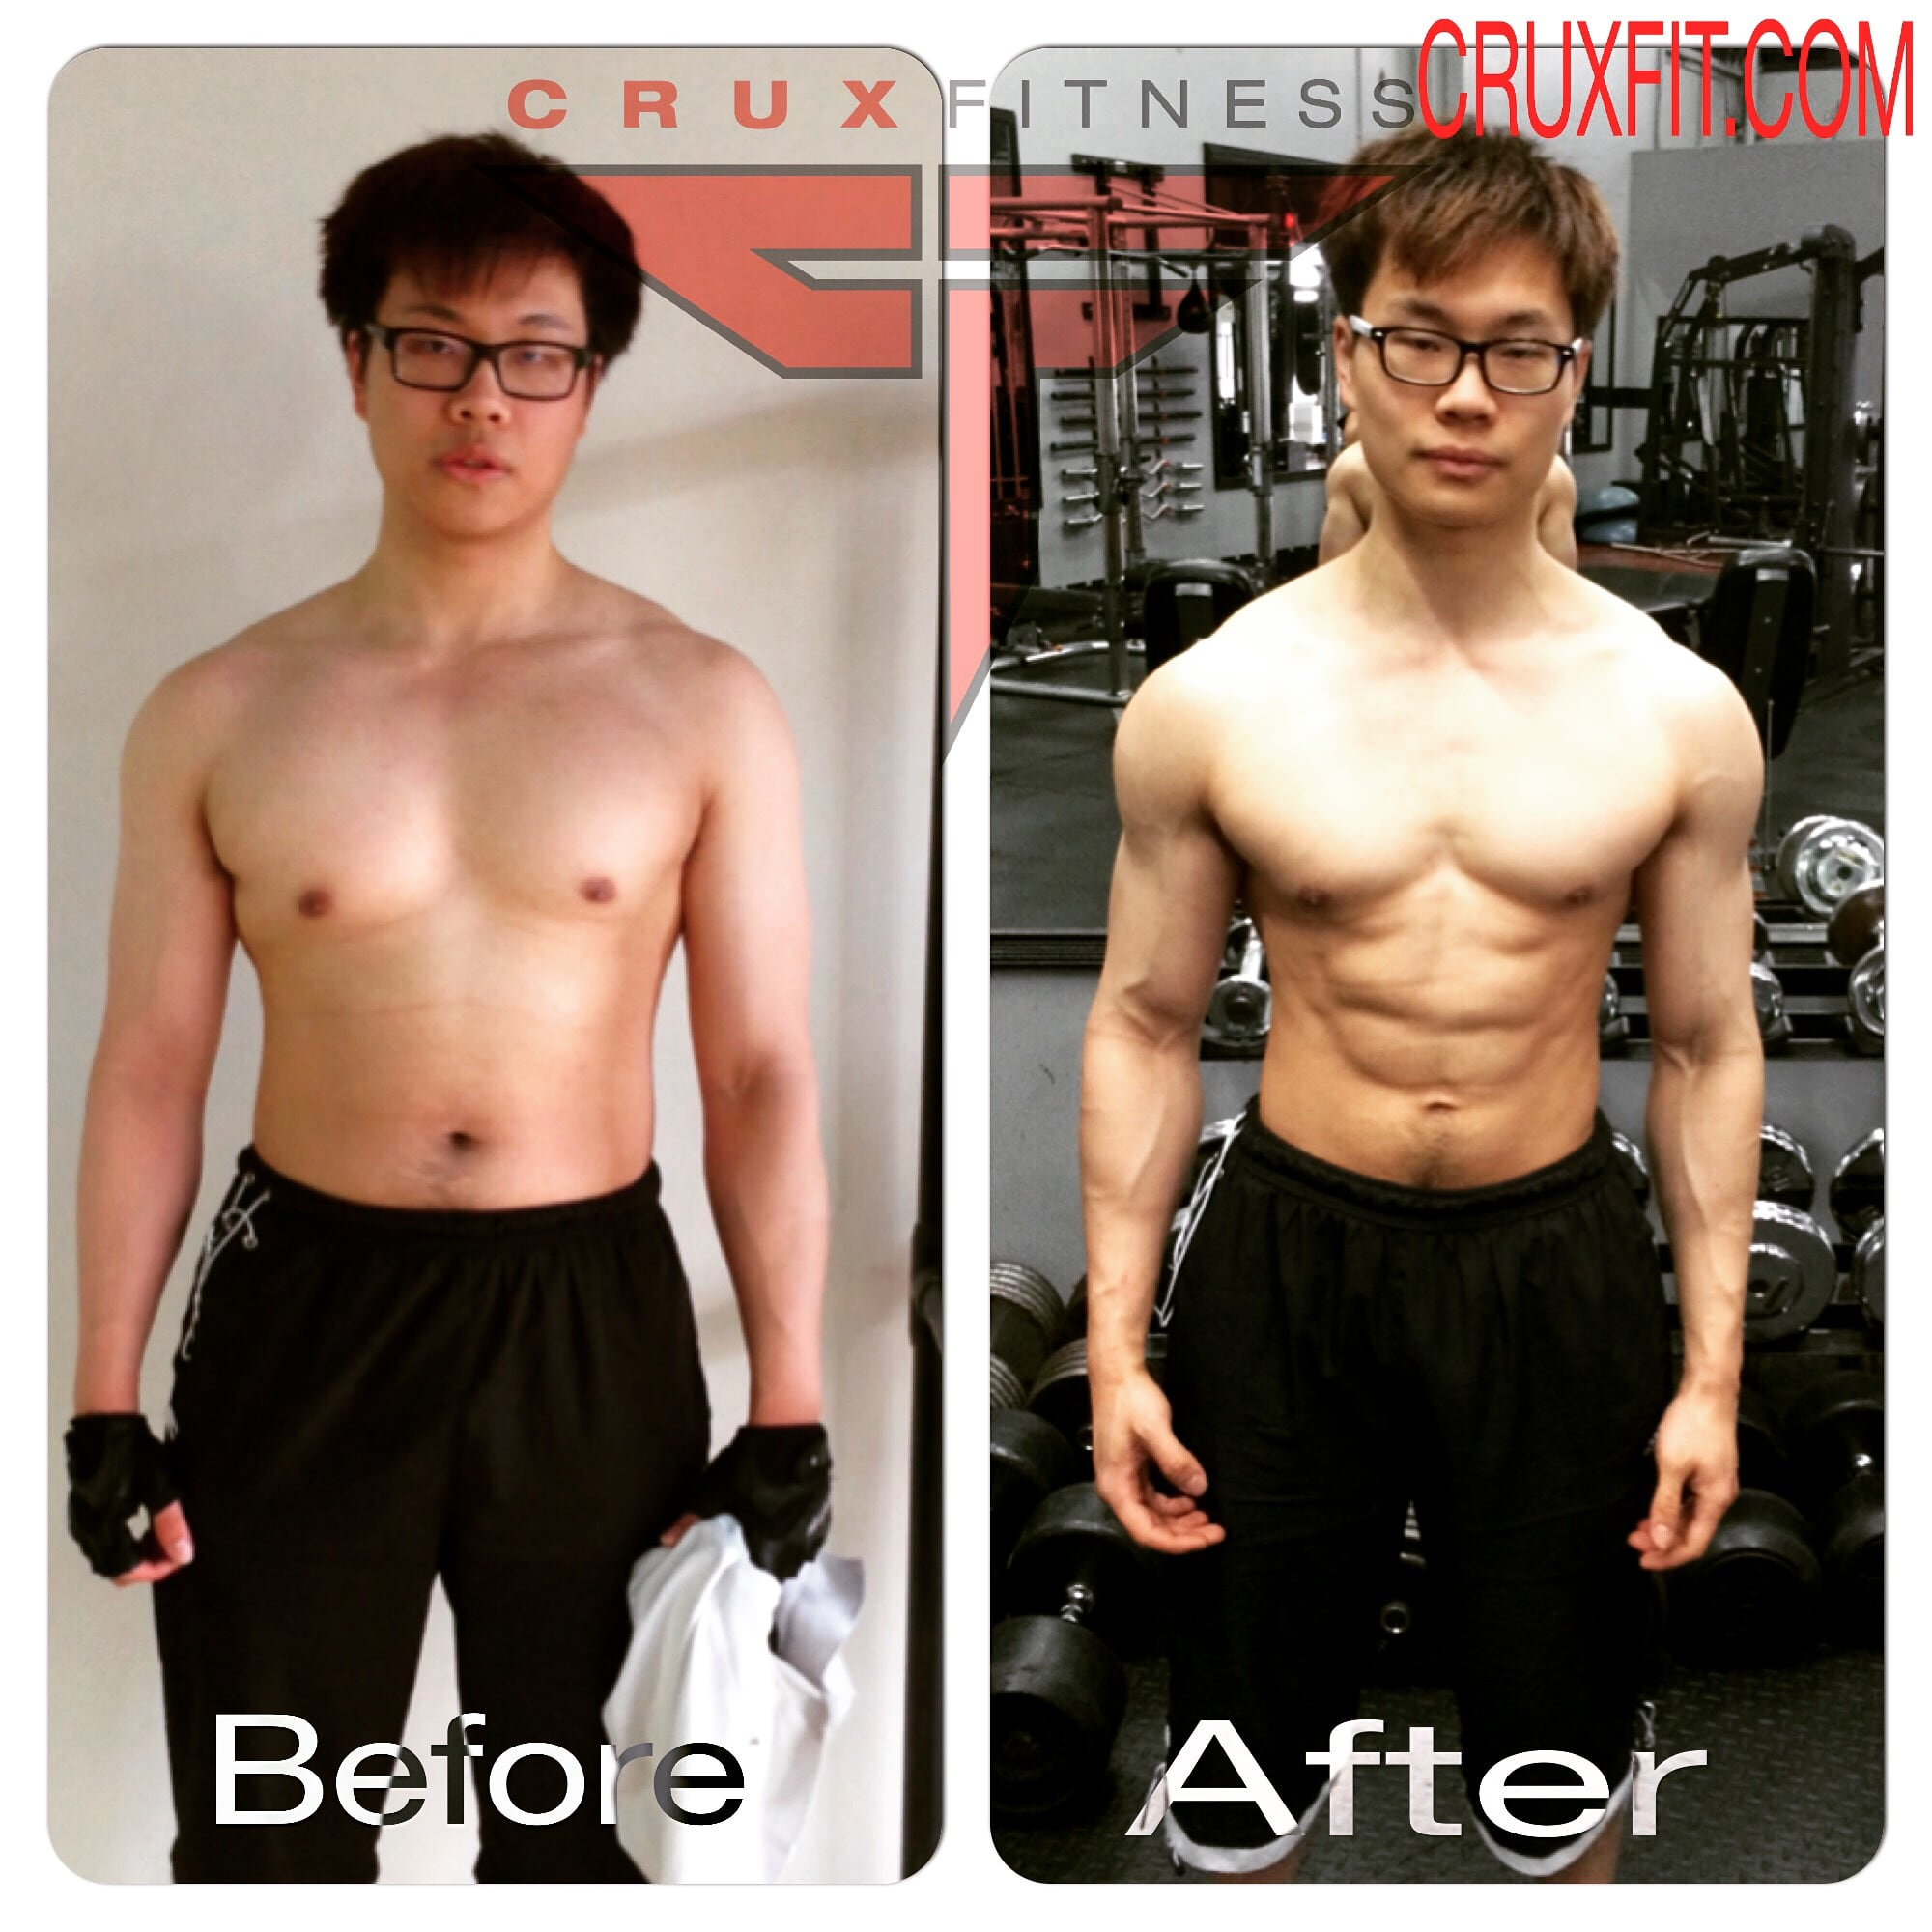 Jacky, Crux Fitness Testimonials